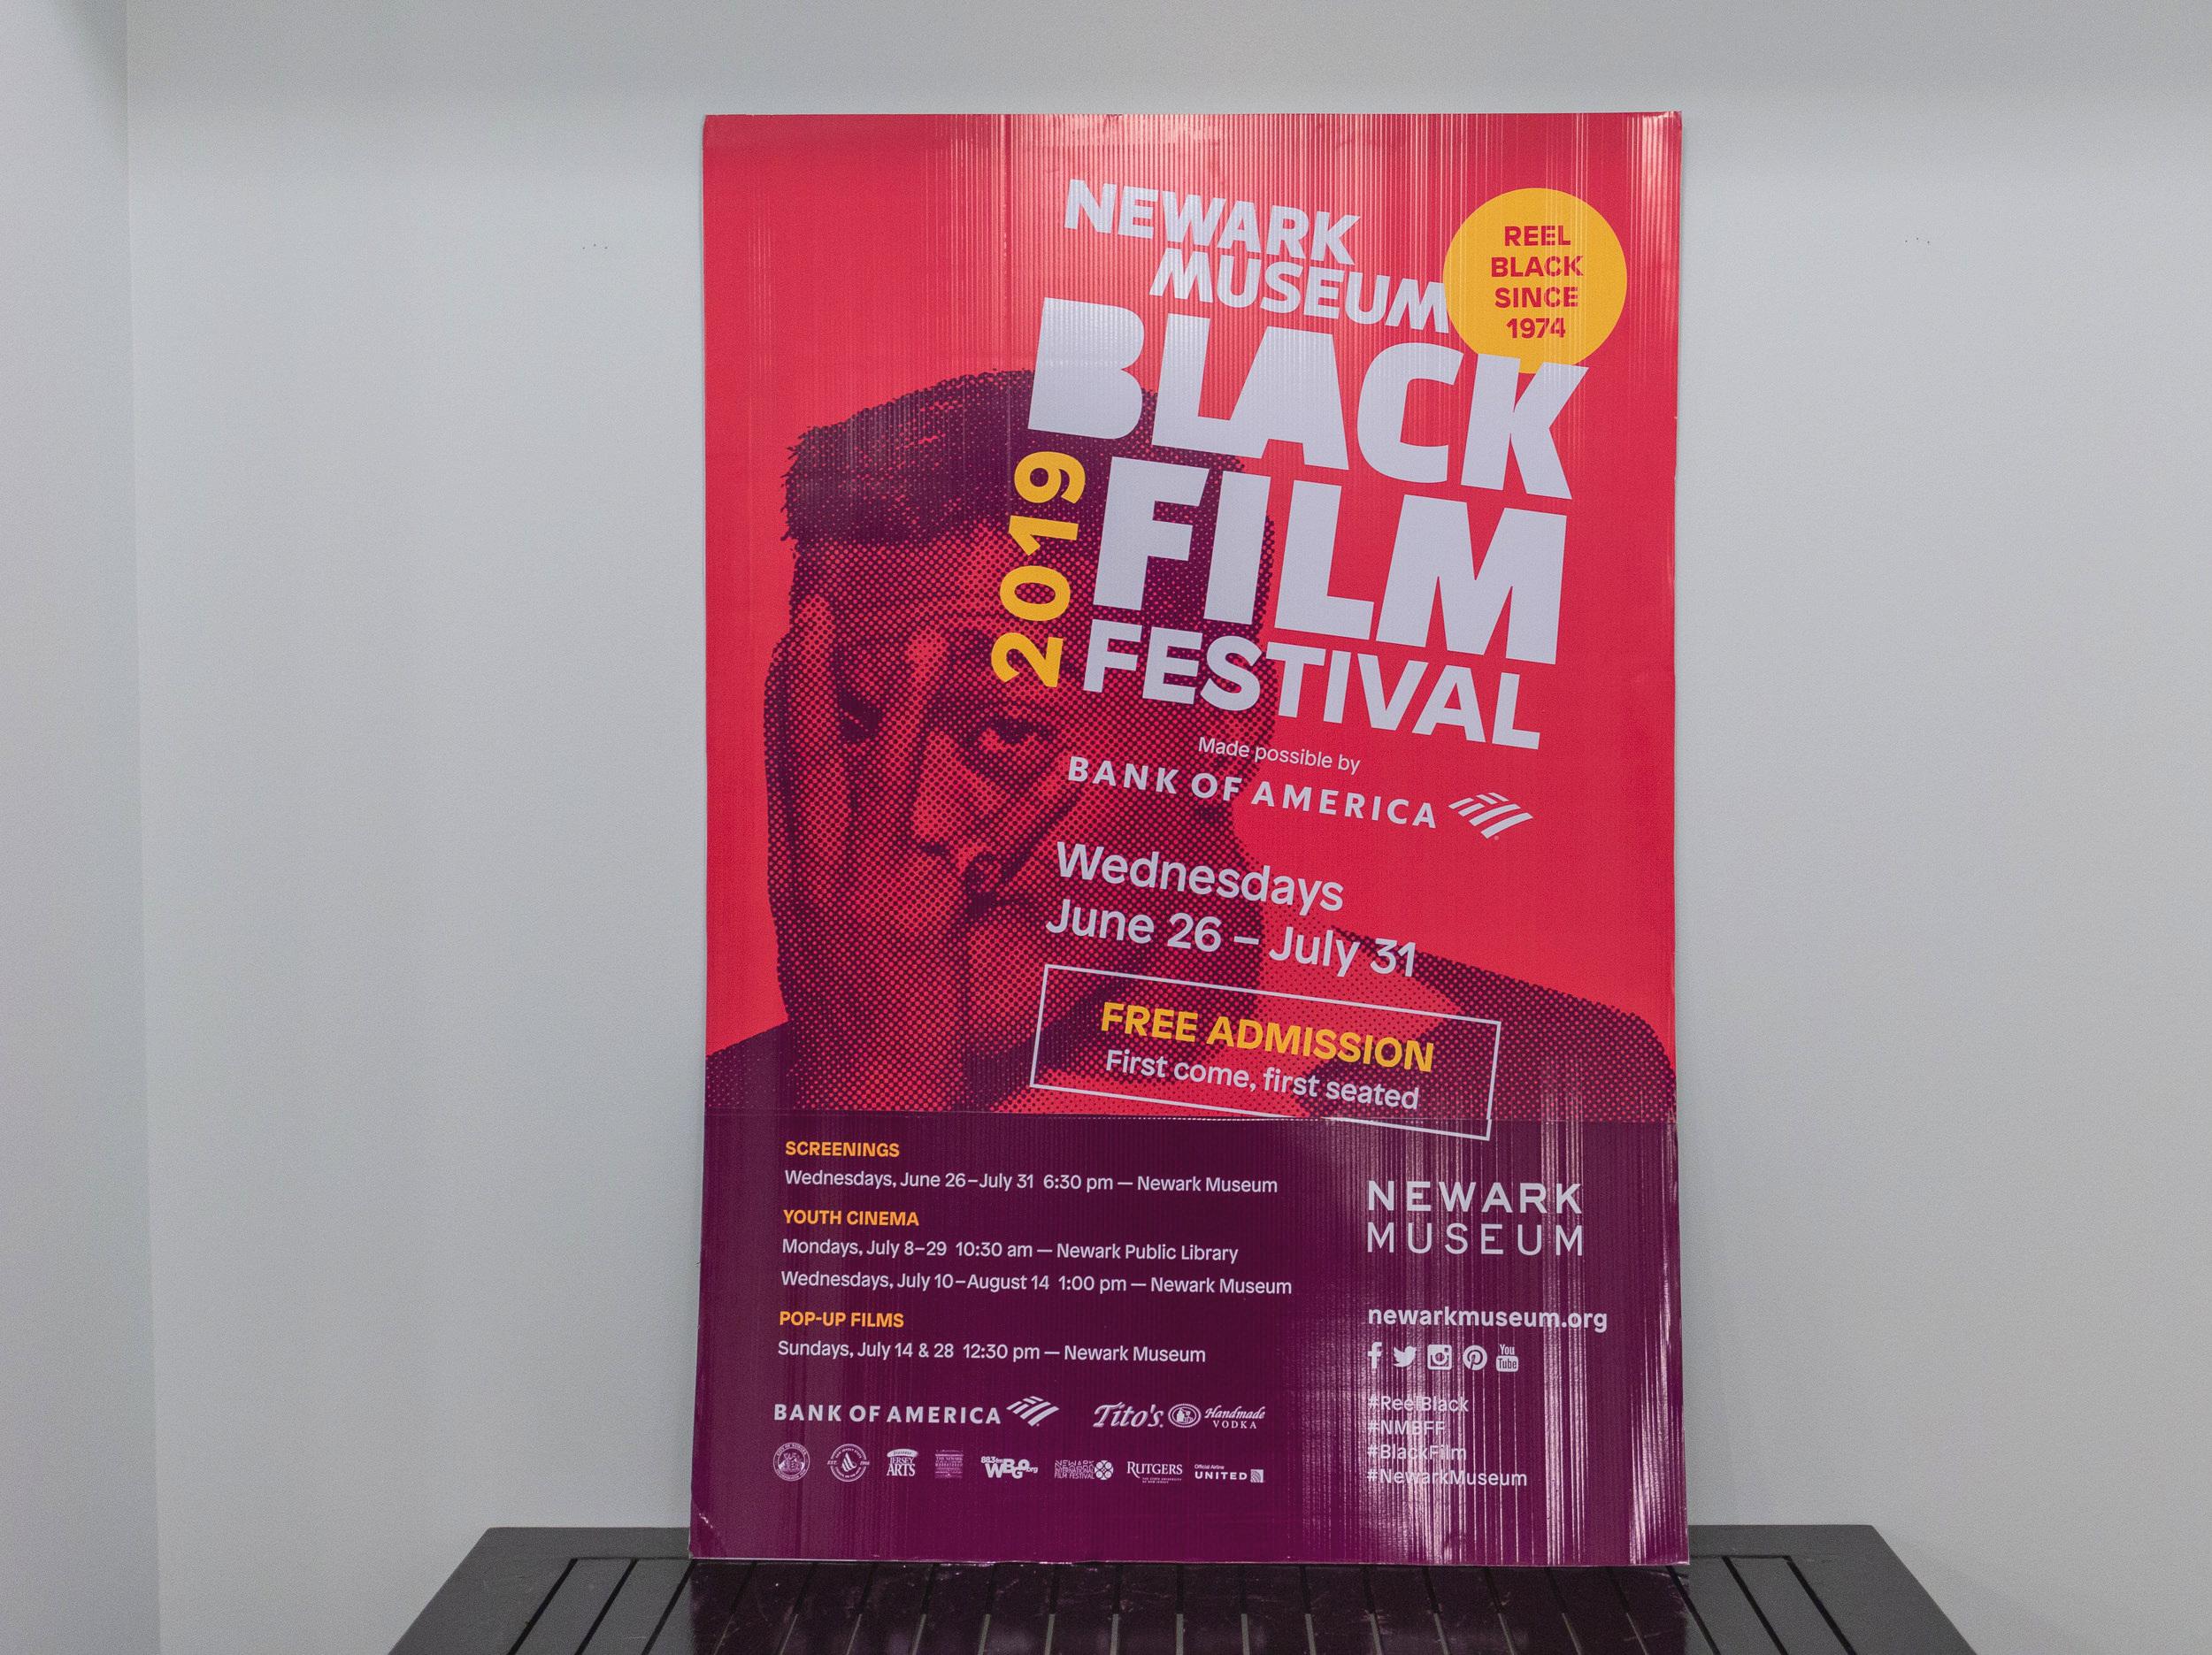 newark museum black film july 24 2019-1.jpg